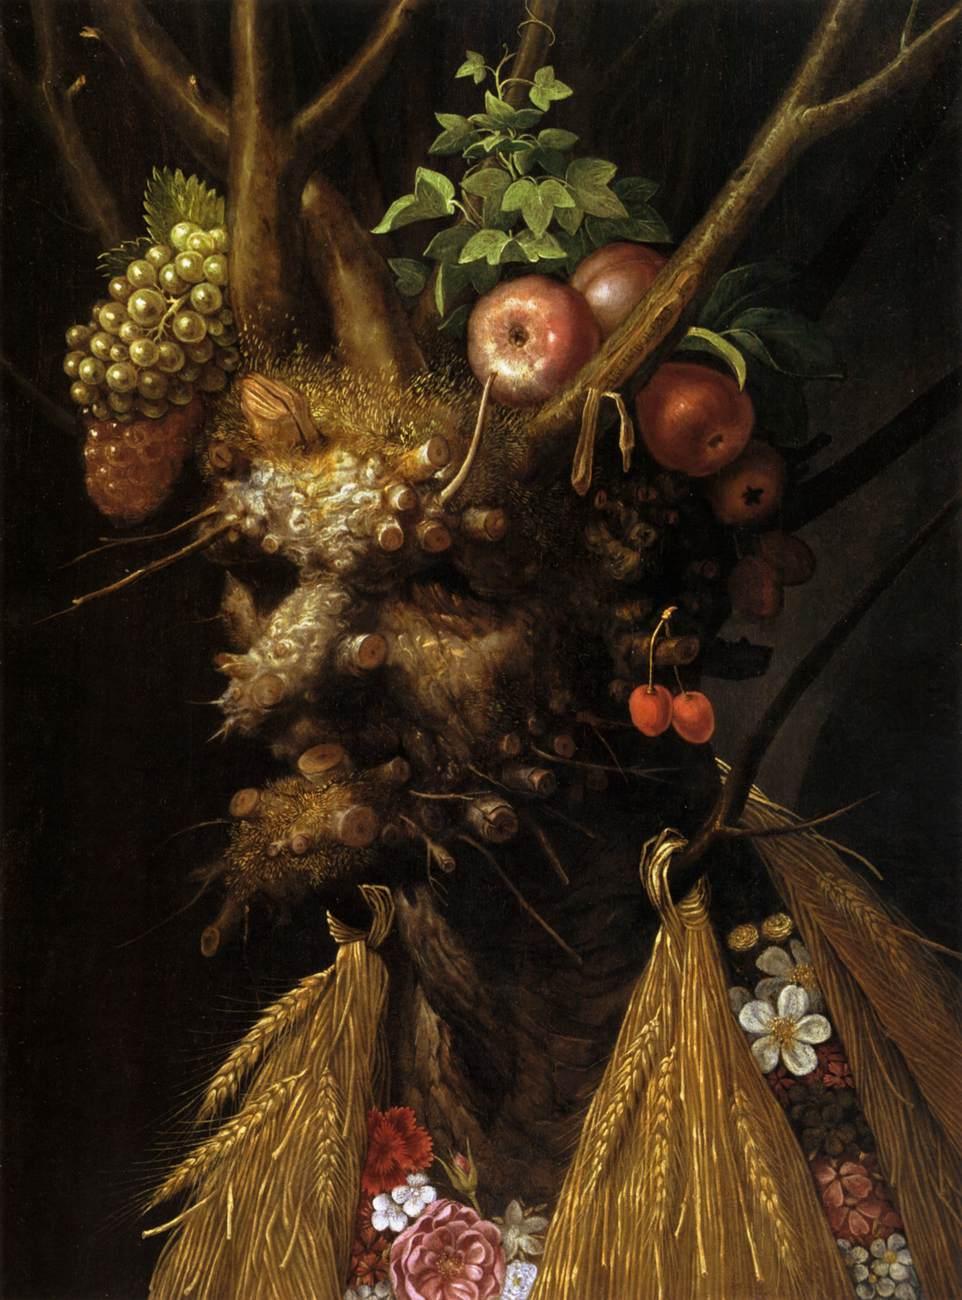 Arcimboldo,  The Four Seasons in one Head